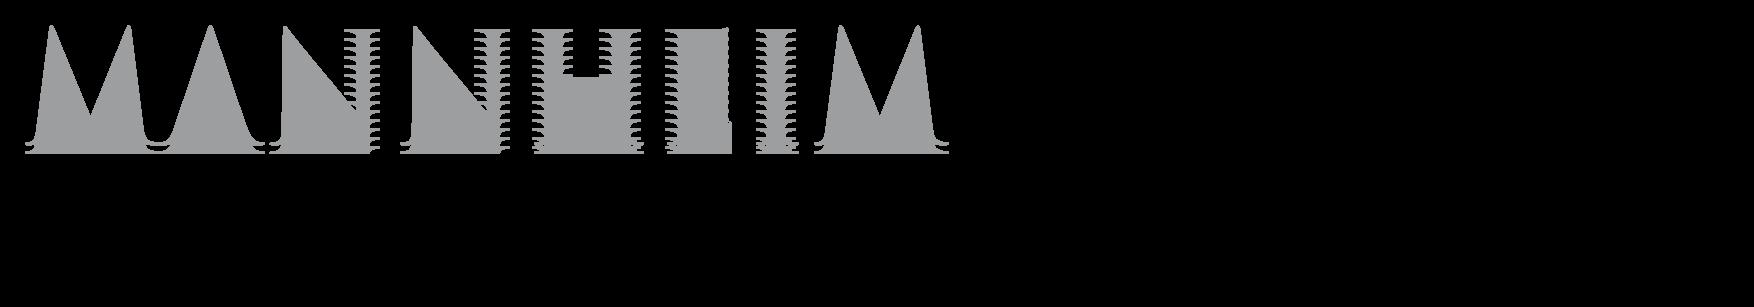 mbs_10_logo_ohne_ggmbh-01